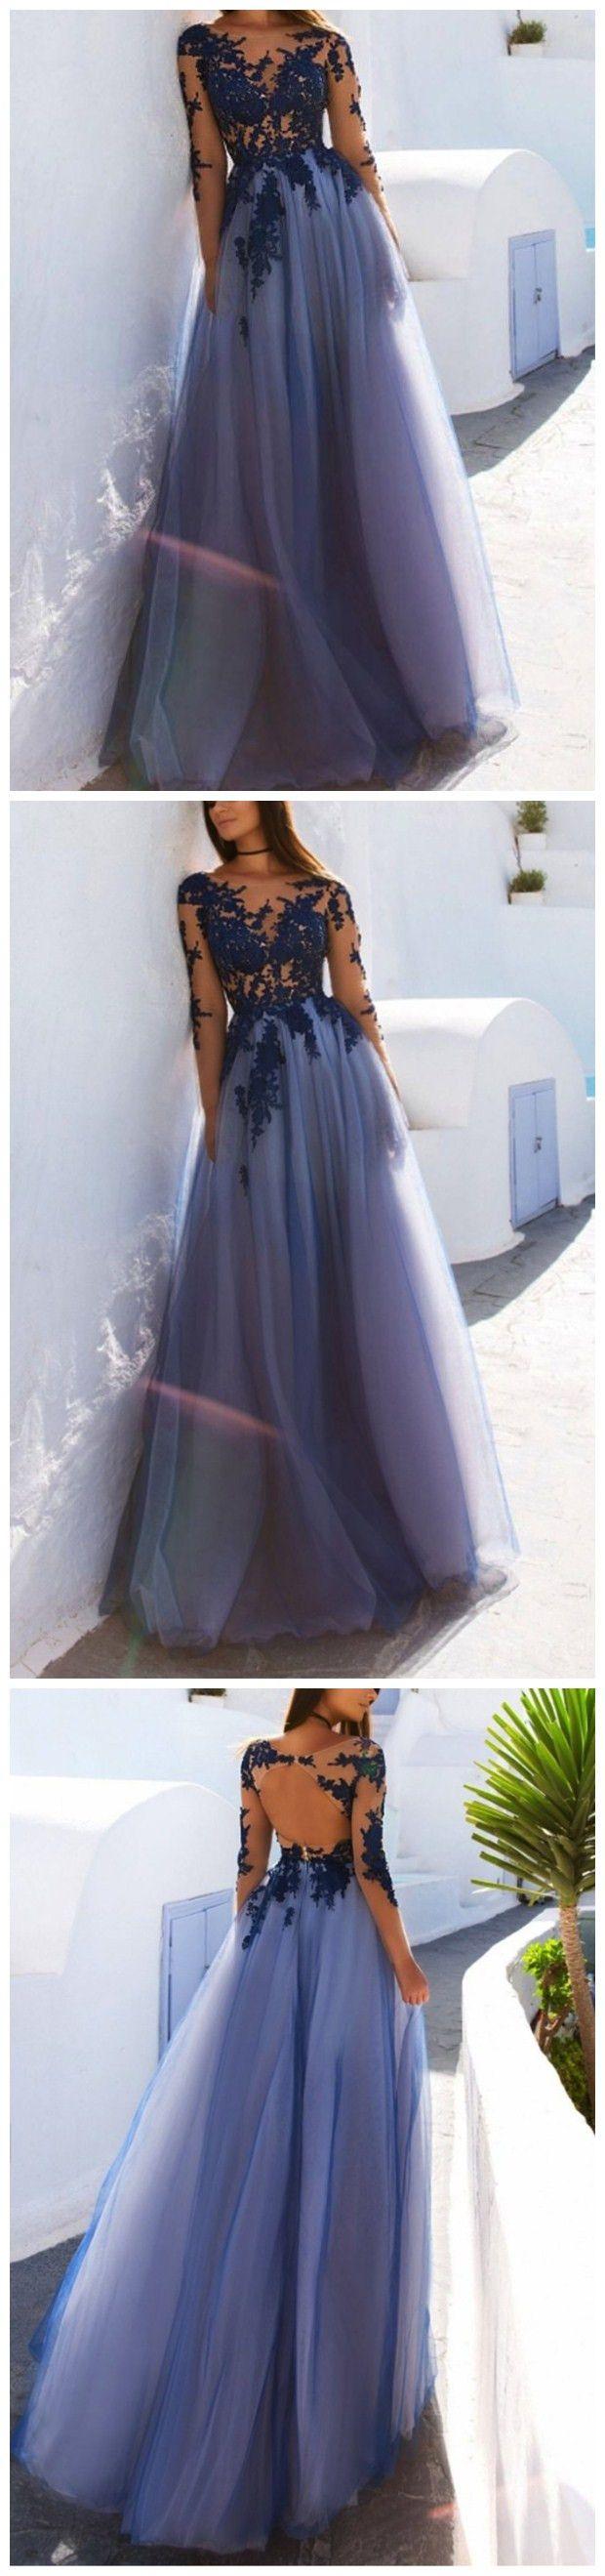 aline prom dresses lavender bateau long sleeve prom dress